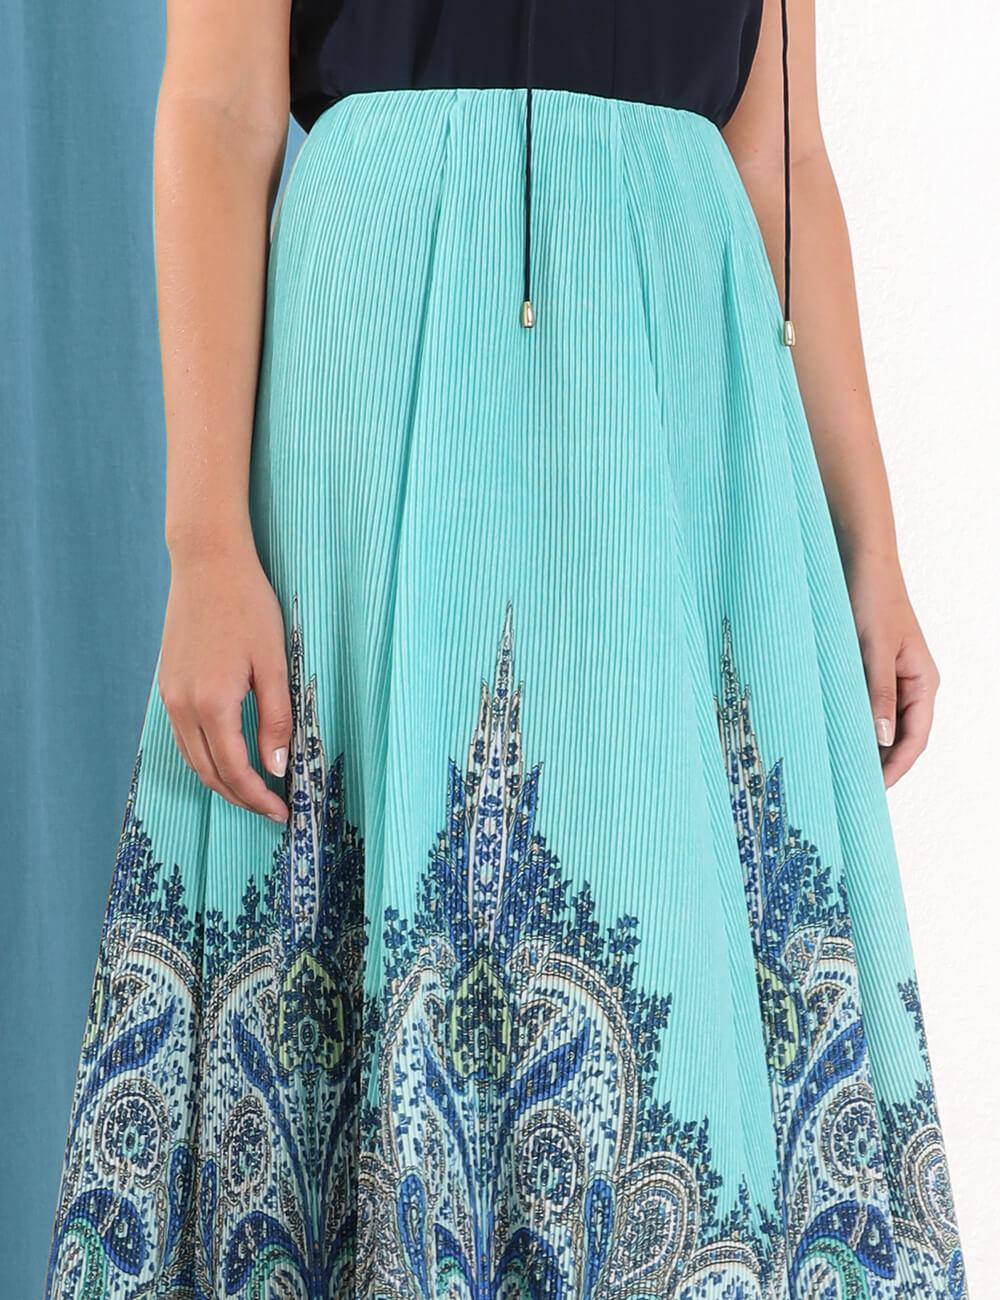 Moncur Ruffle Midi Skirt